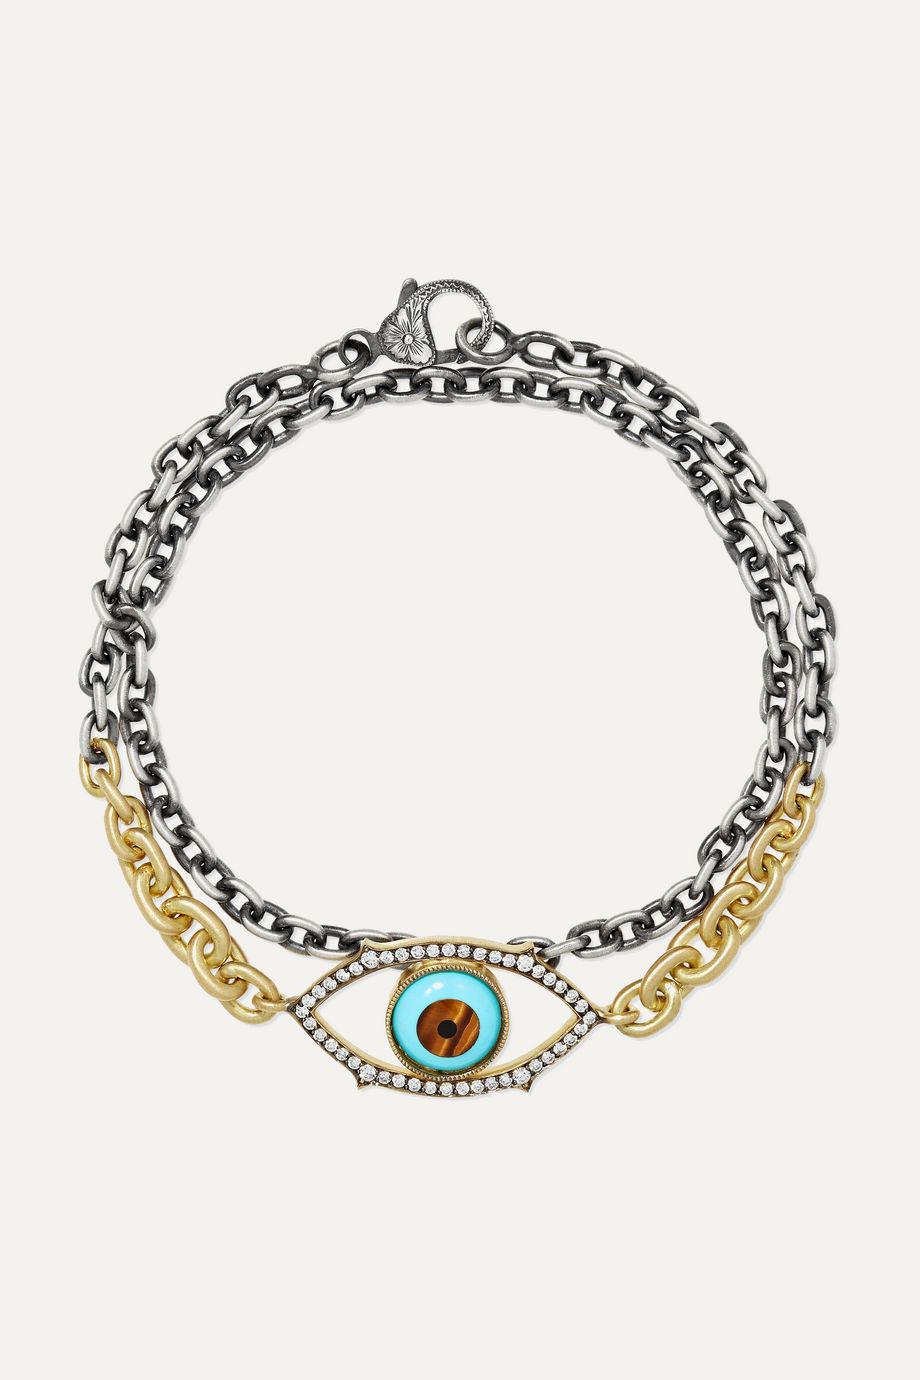 Sylva & Cie 18-karat gold, sterling silver and multi-stone bracelet